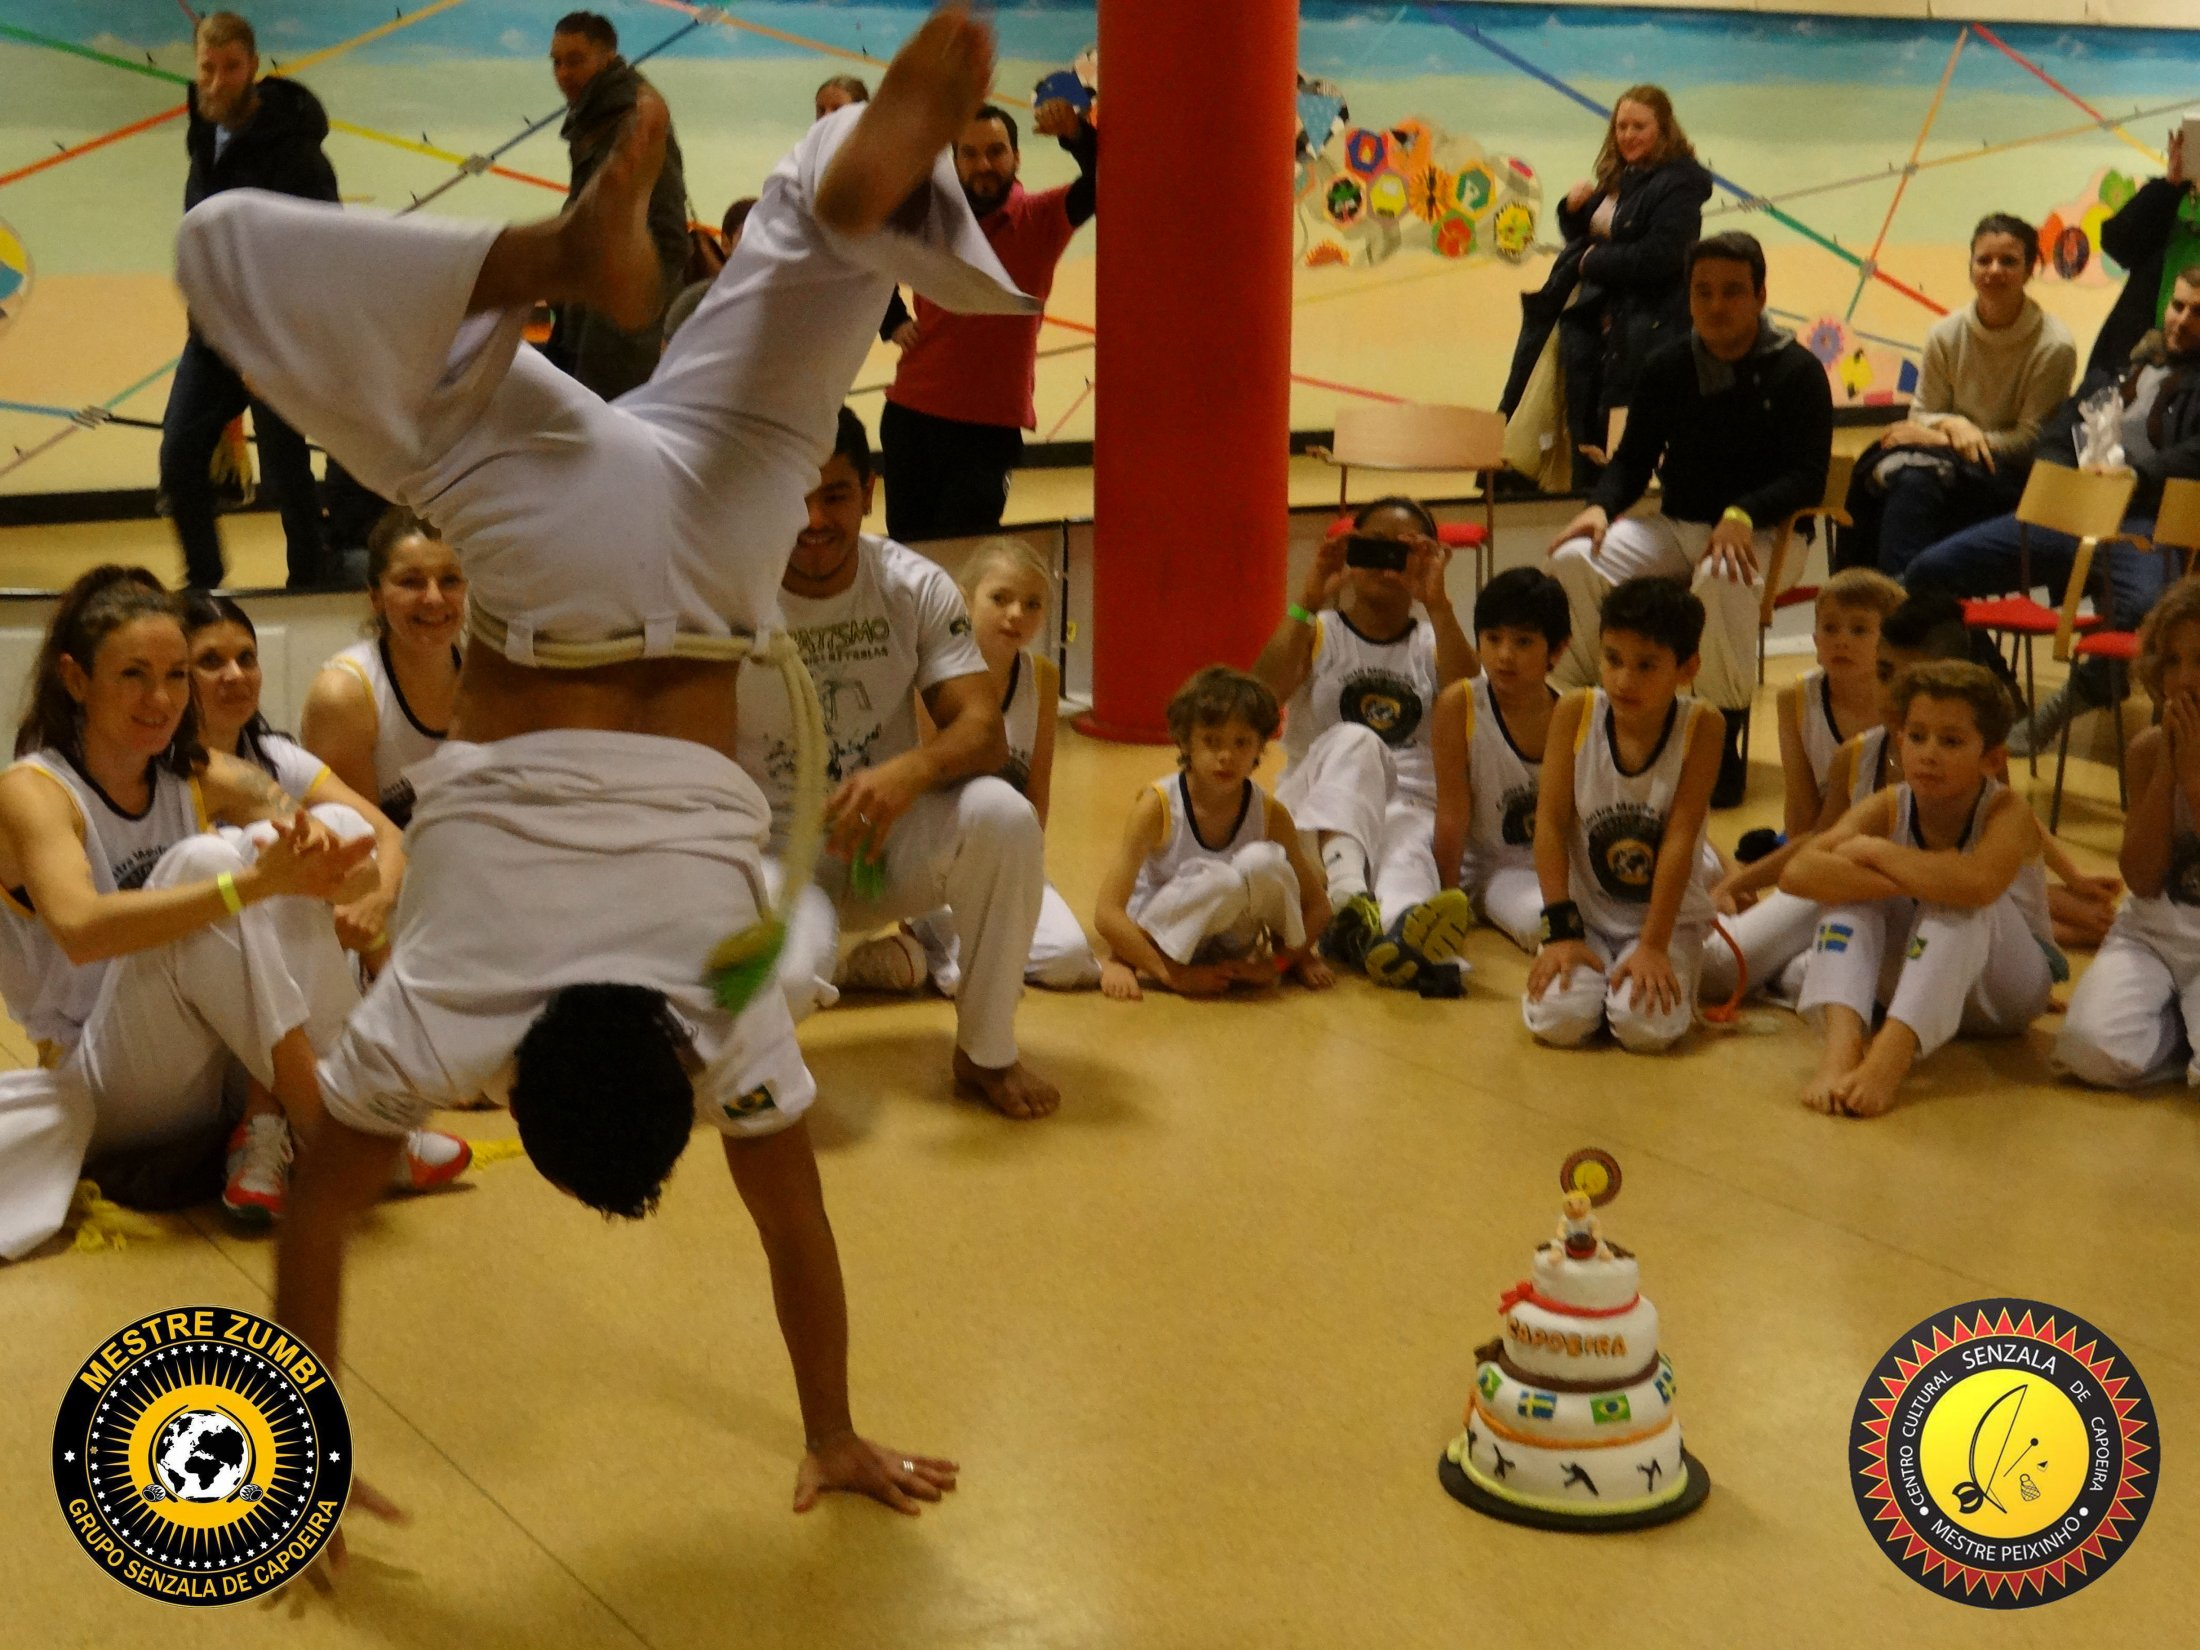 2013-12-14 - Capoeira 106